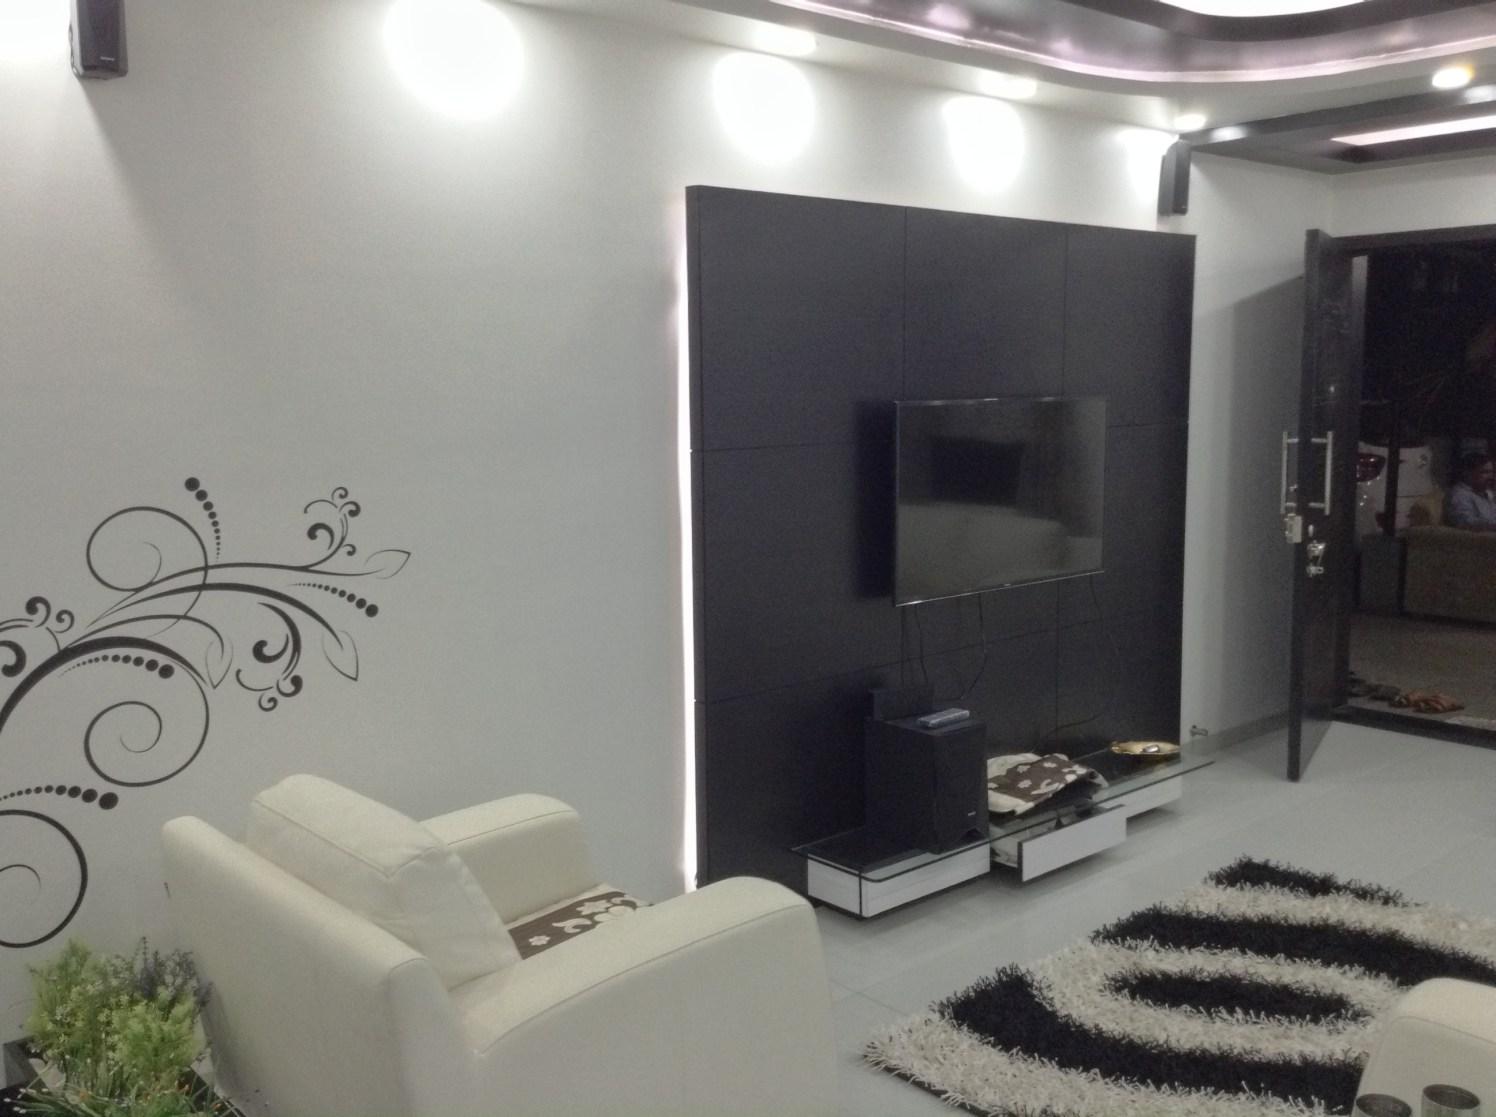 The Color Theory by Siddhant Ashtekar Living-room Contemporary | Interior Design Photos & Ideas